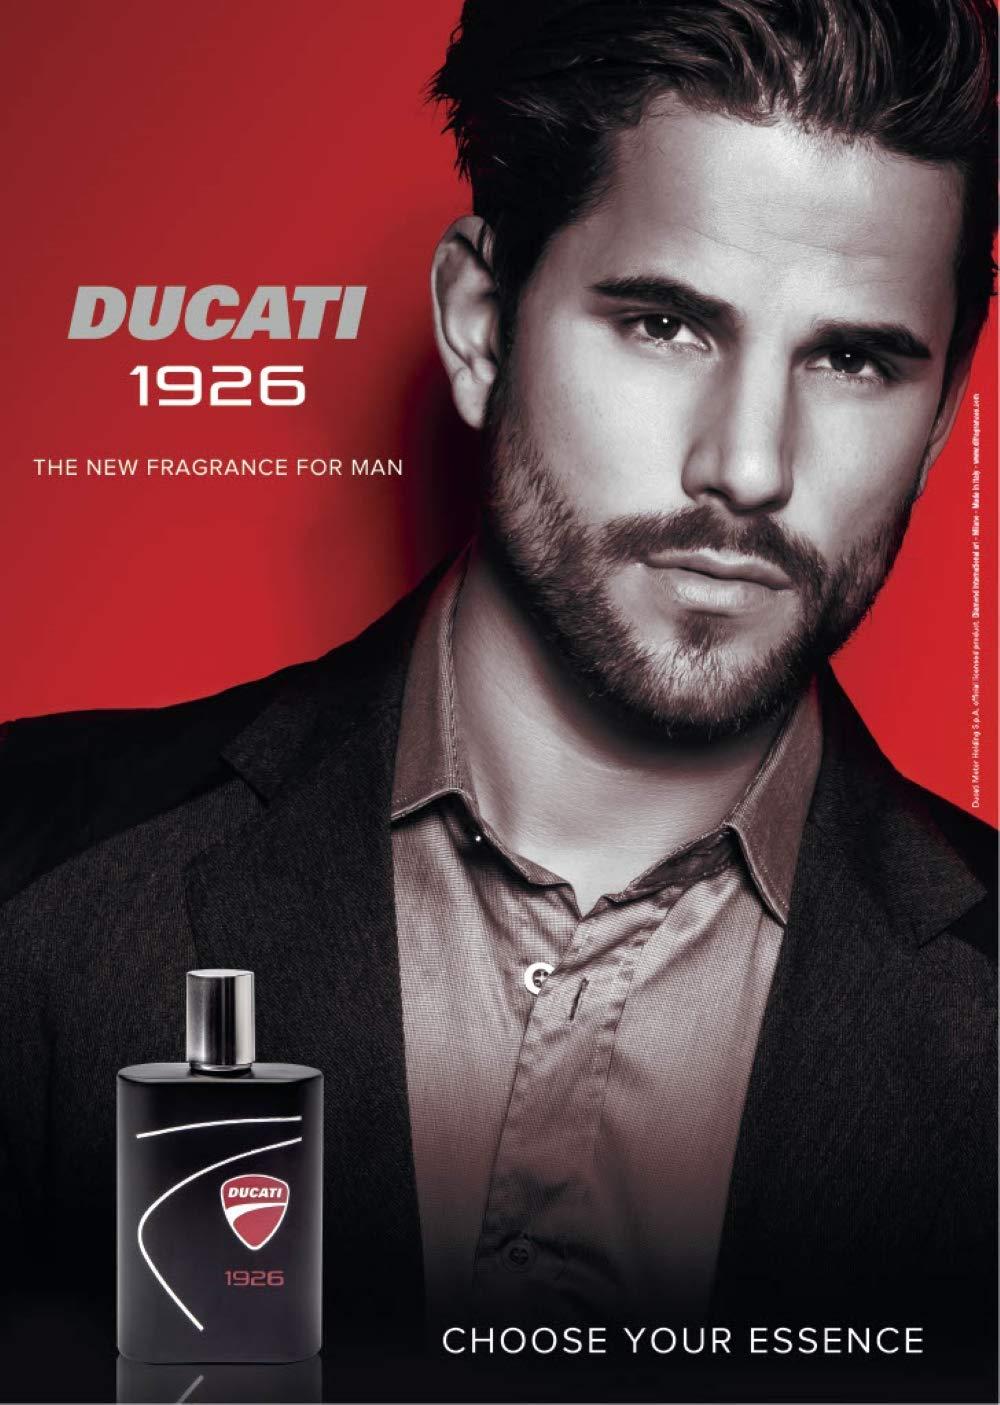 Buy NEW | Ducati Cologne for Men, Eau De Toilette Men's Fragrances. (1926,  3.4 Fl Oz) Online in Taiwan. B0758VJ8BR